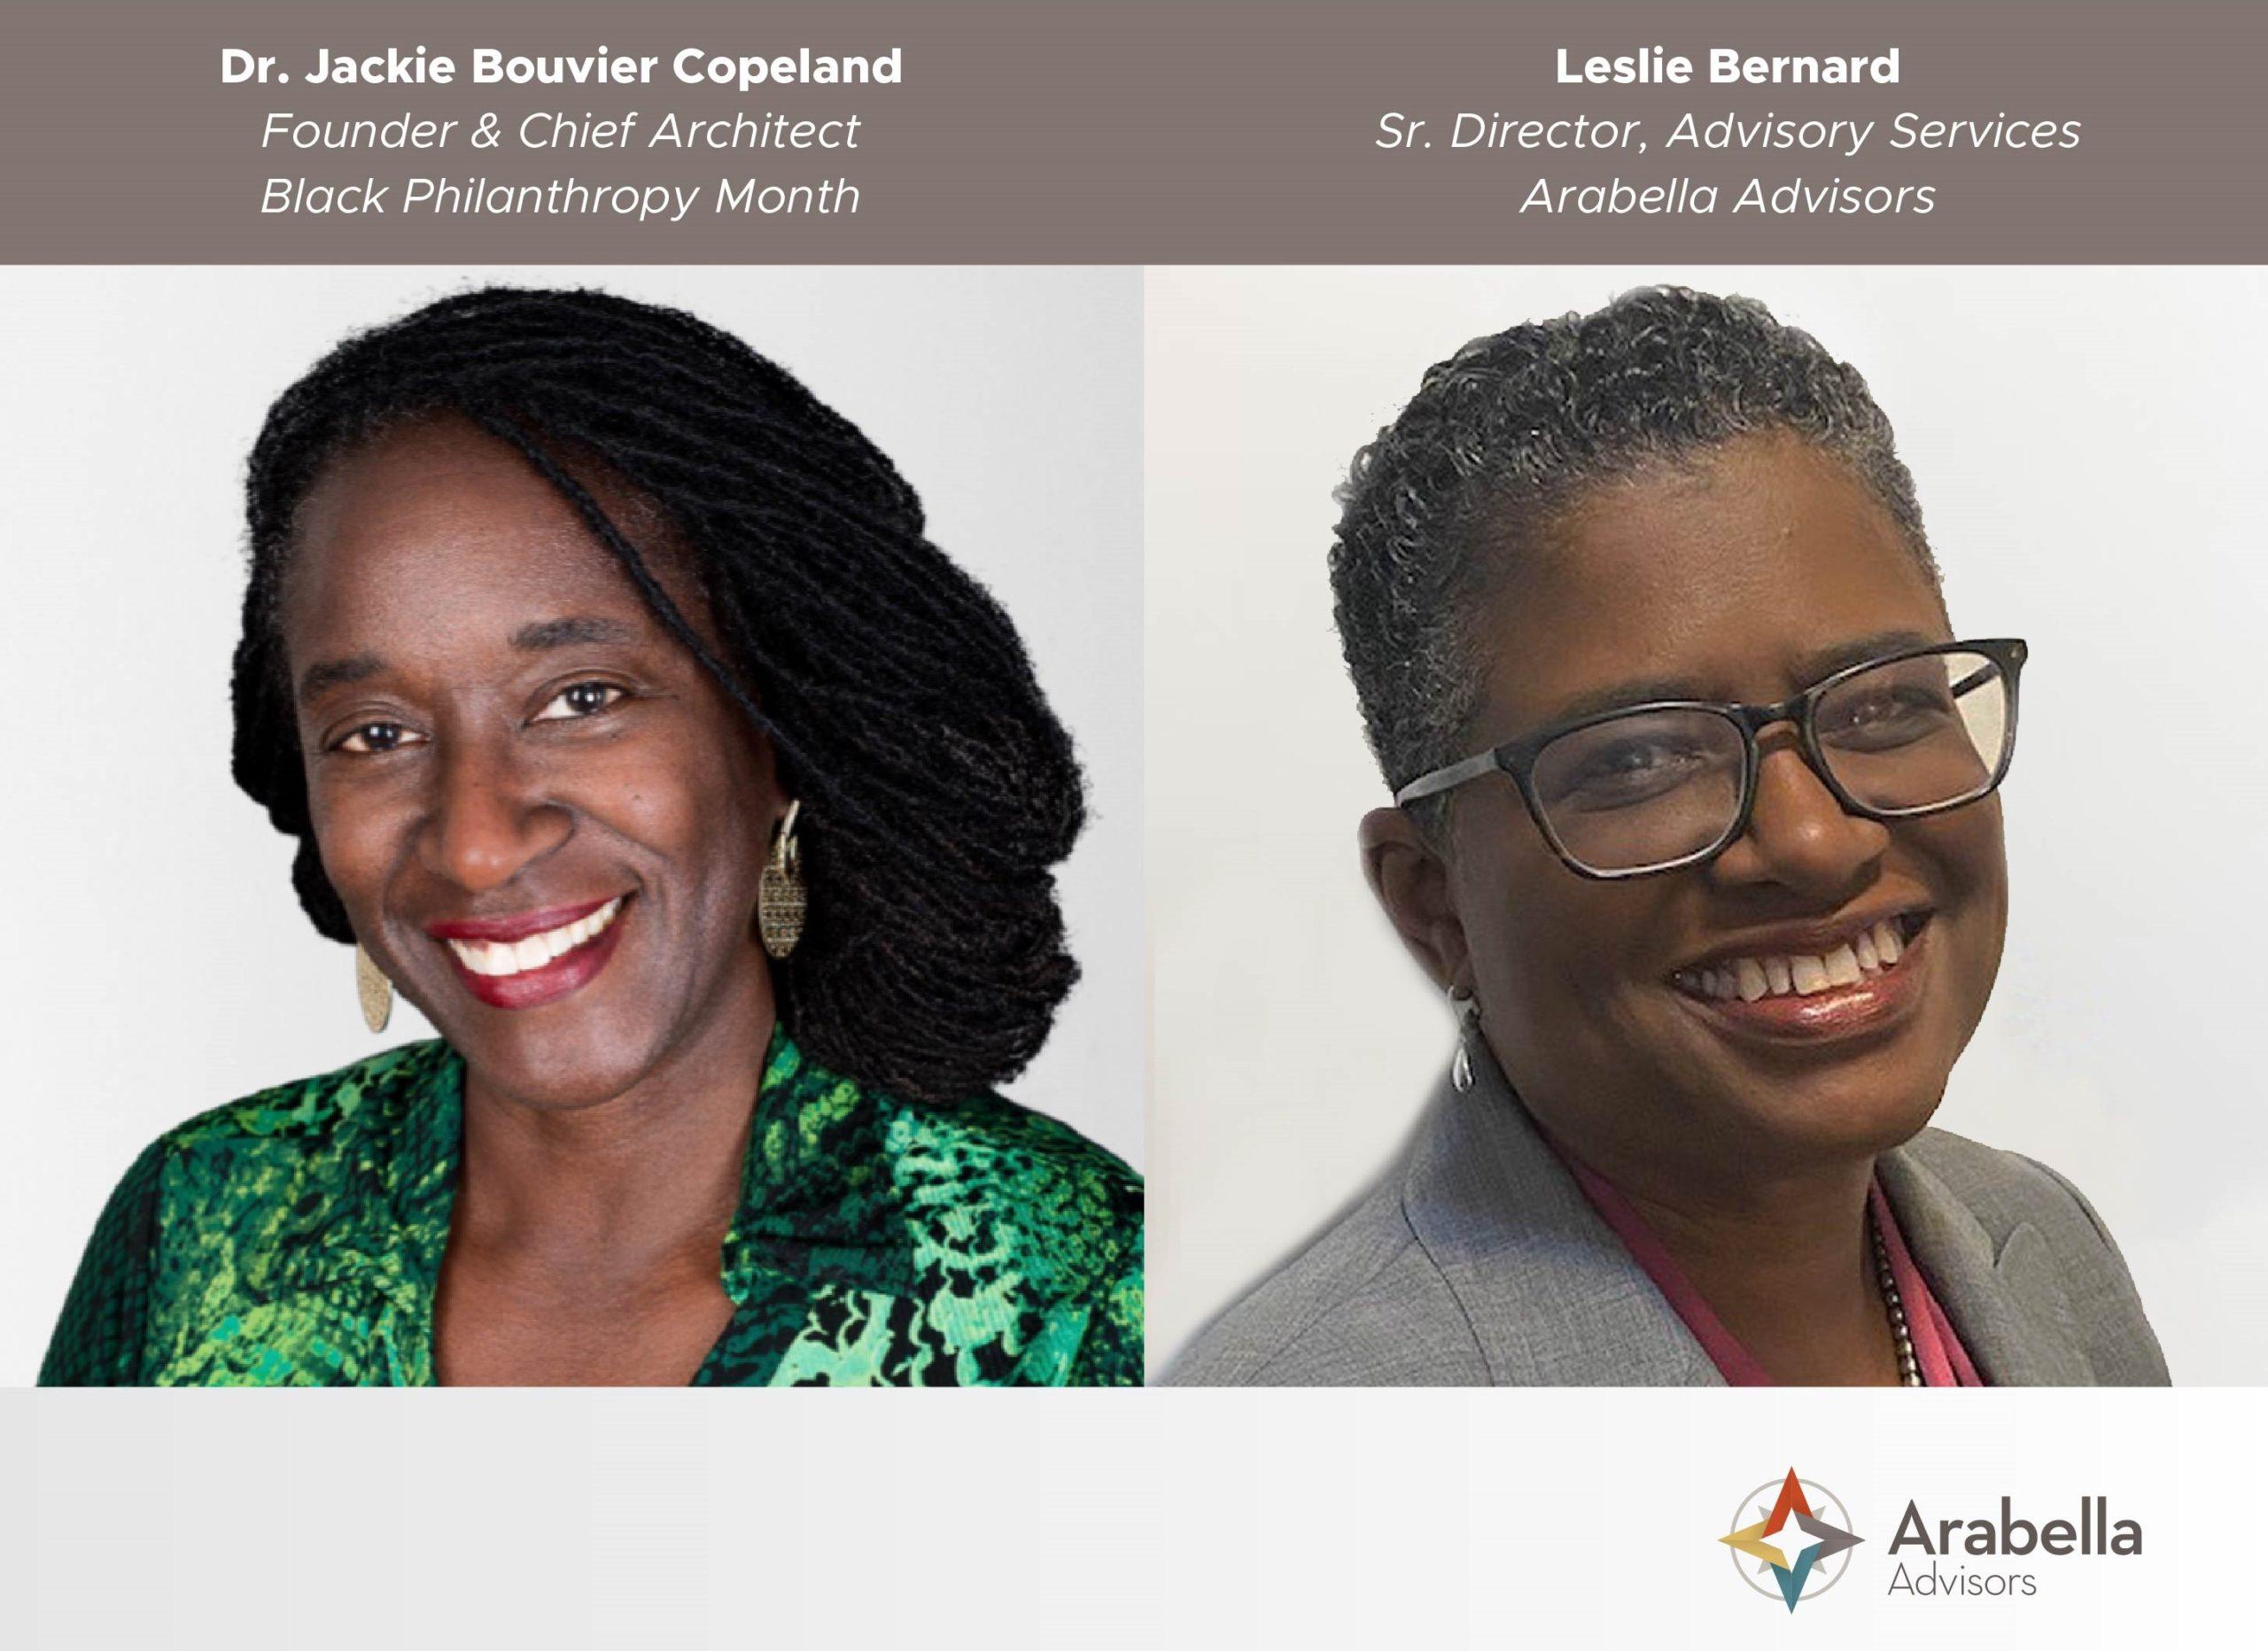 Dr. Jackie Bouvier Copeland and Black Philanthropy Month